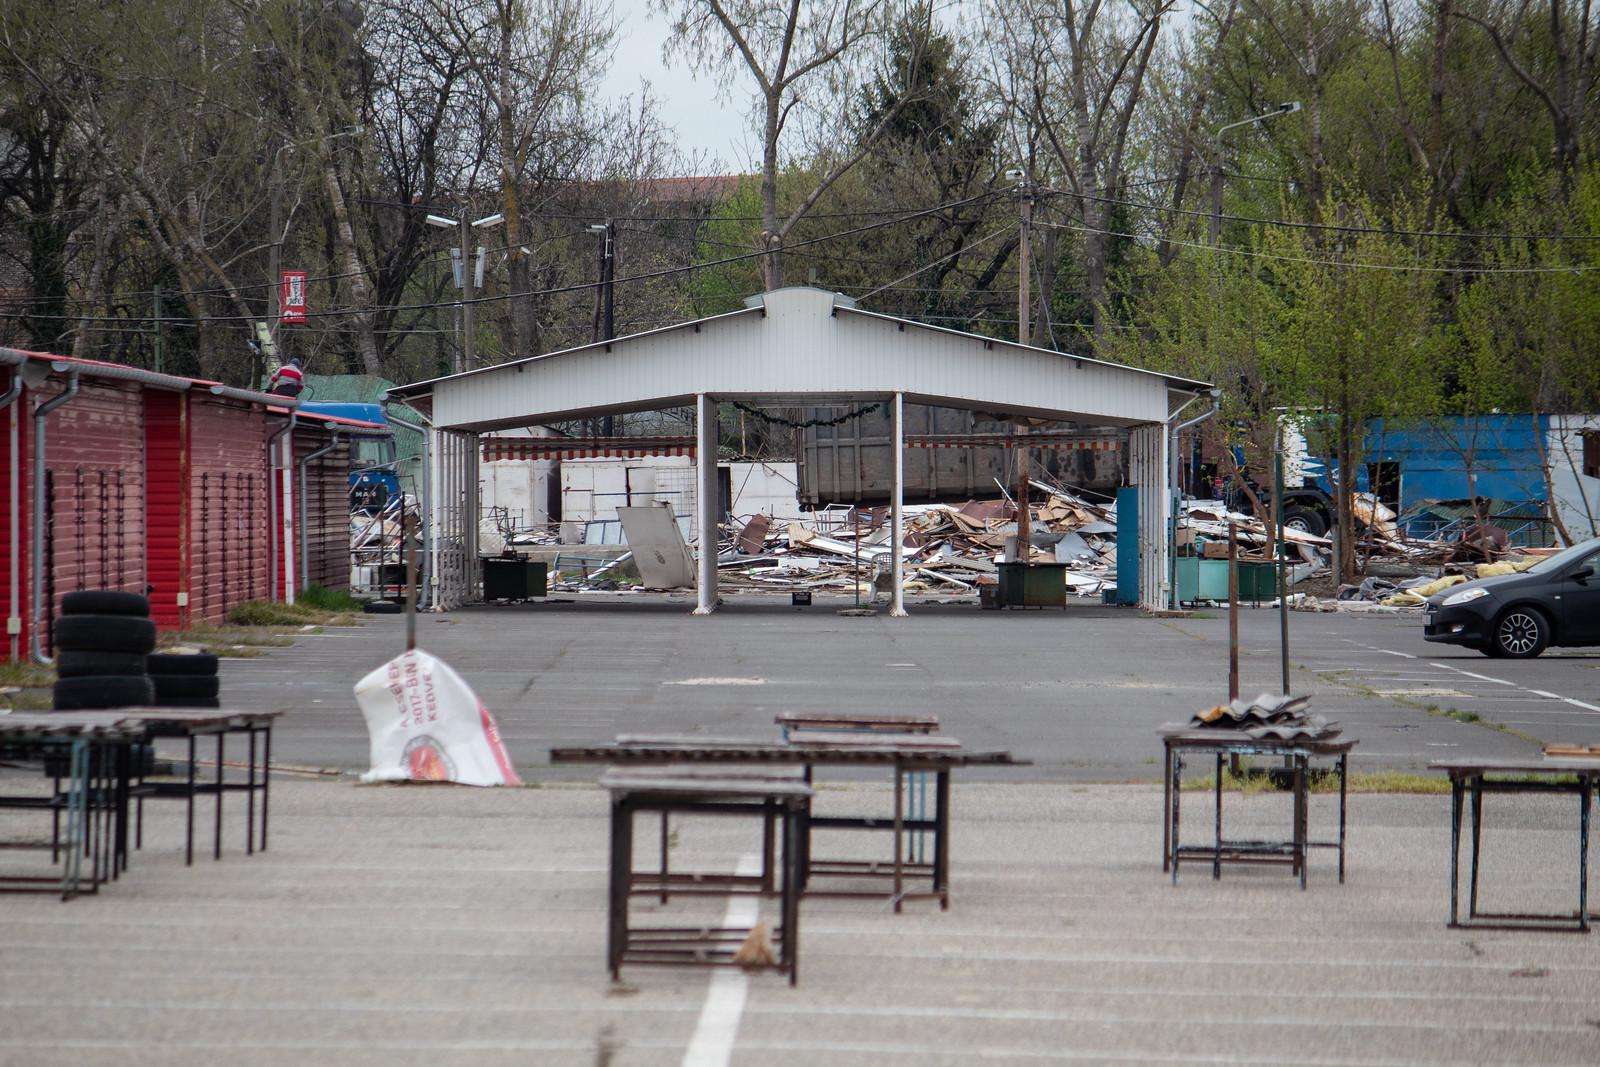 Elkezdték lerombolni a Cserepes sori piacot